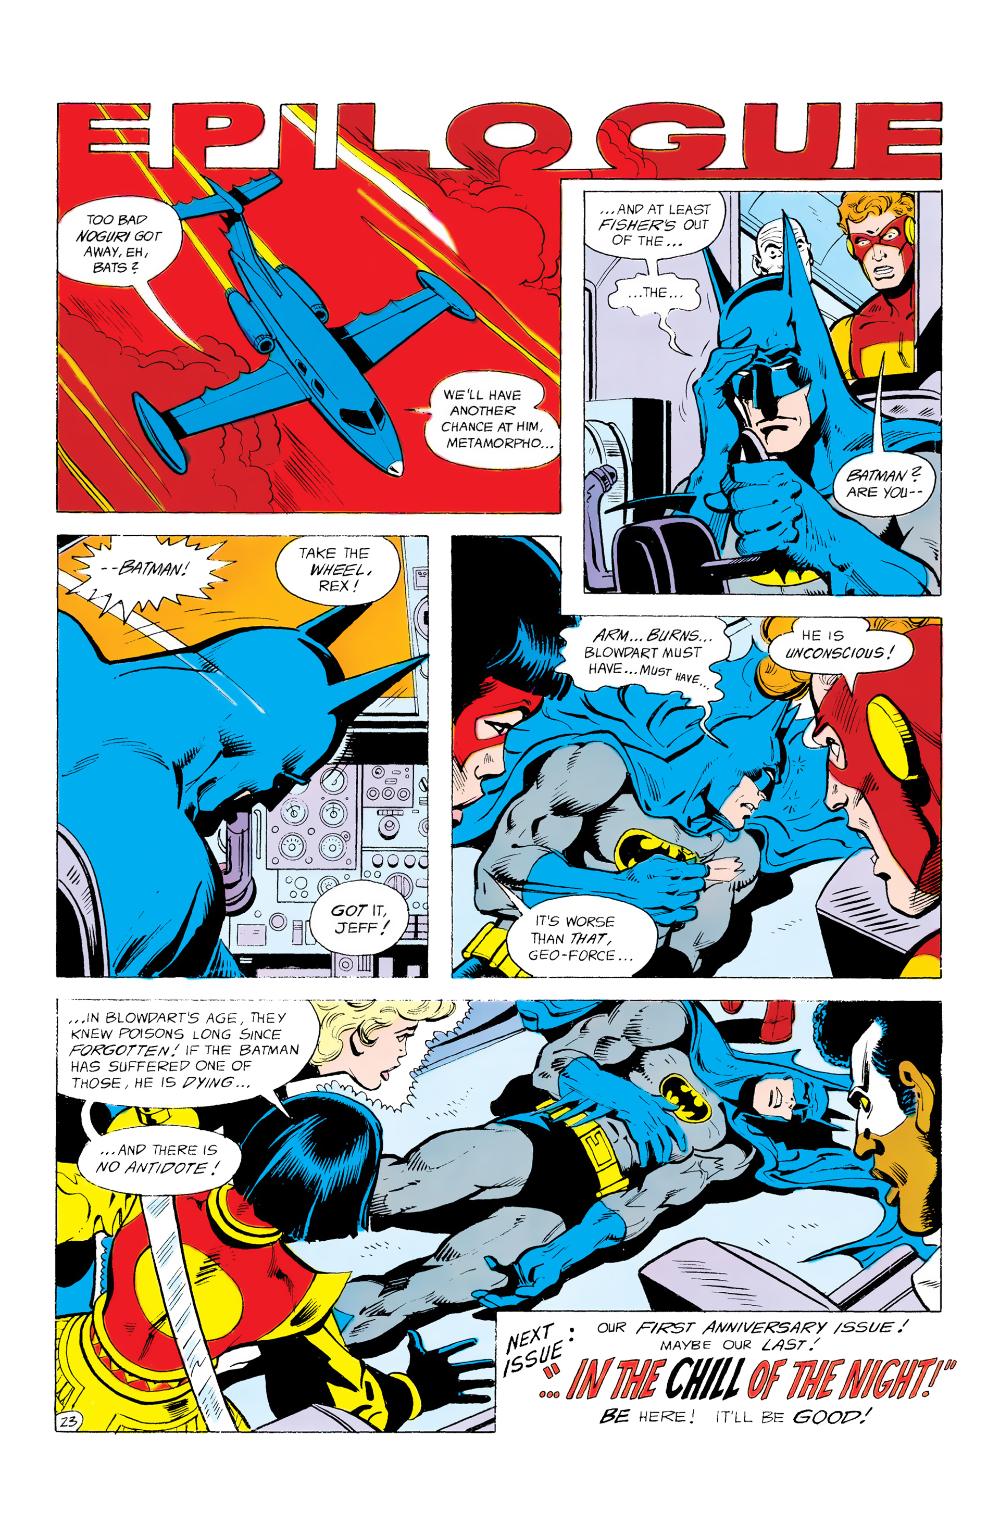 Batman And The Outsiders 1983 Issue 12 Read Batman And The Outsiders 1983 Issue 12 Comic Online In High Quality Comics Comics Online Comic Books